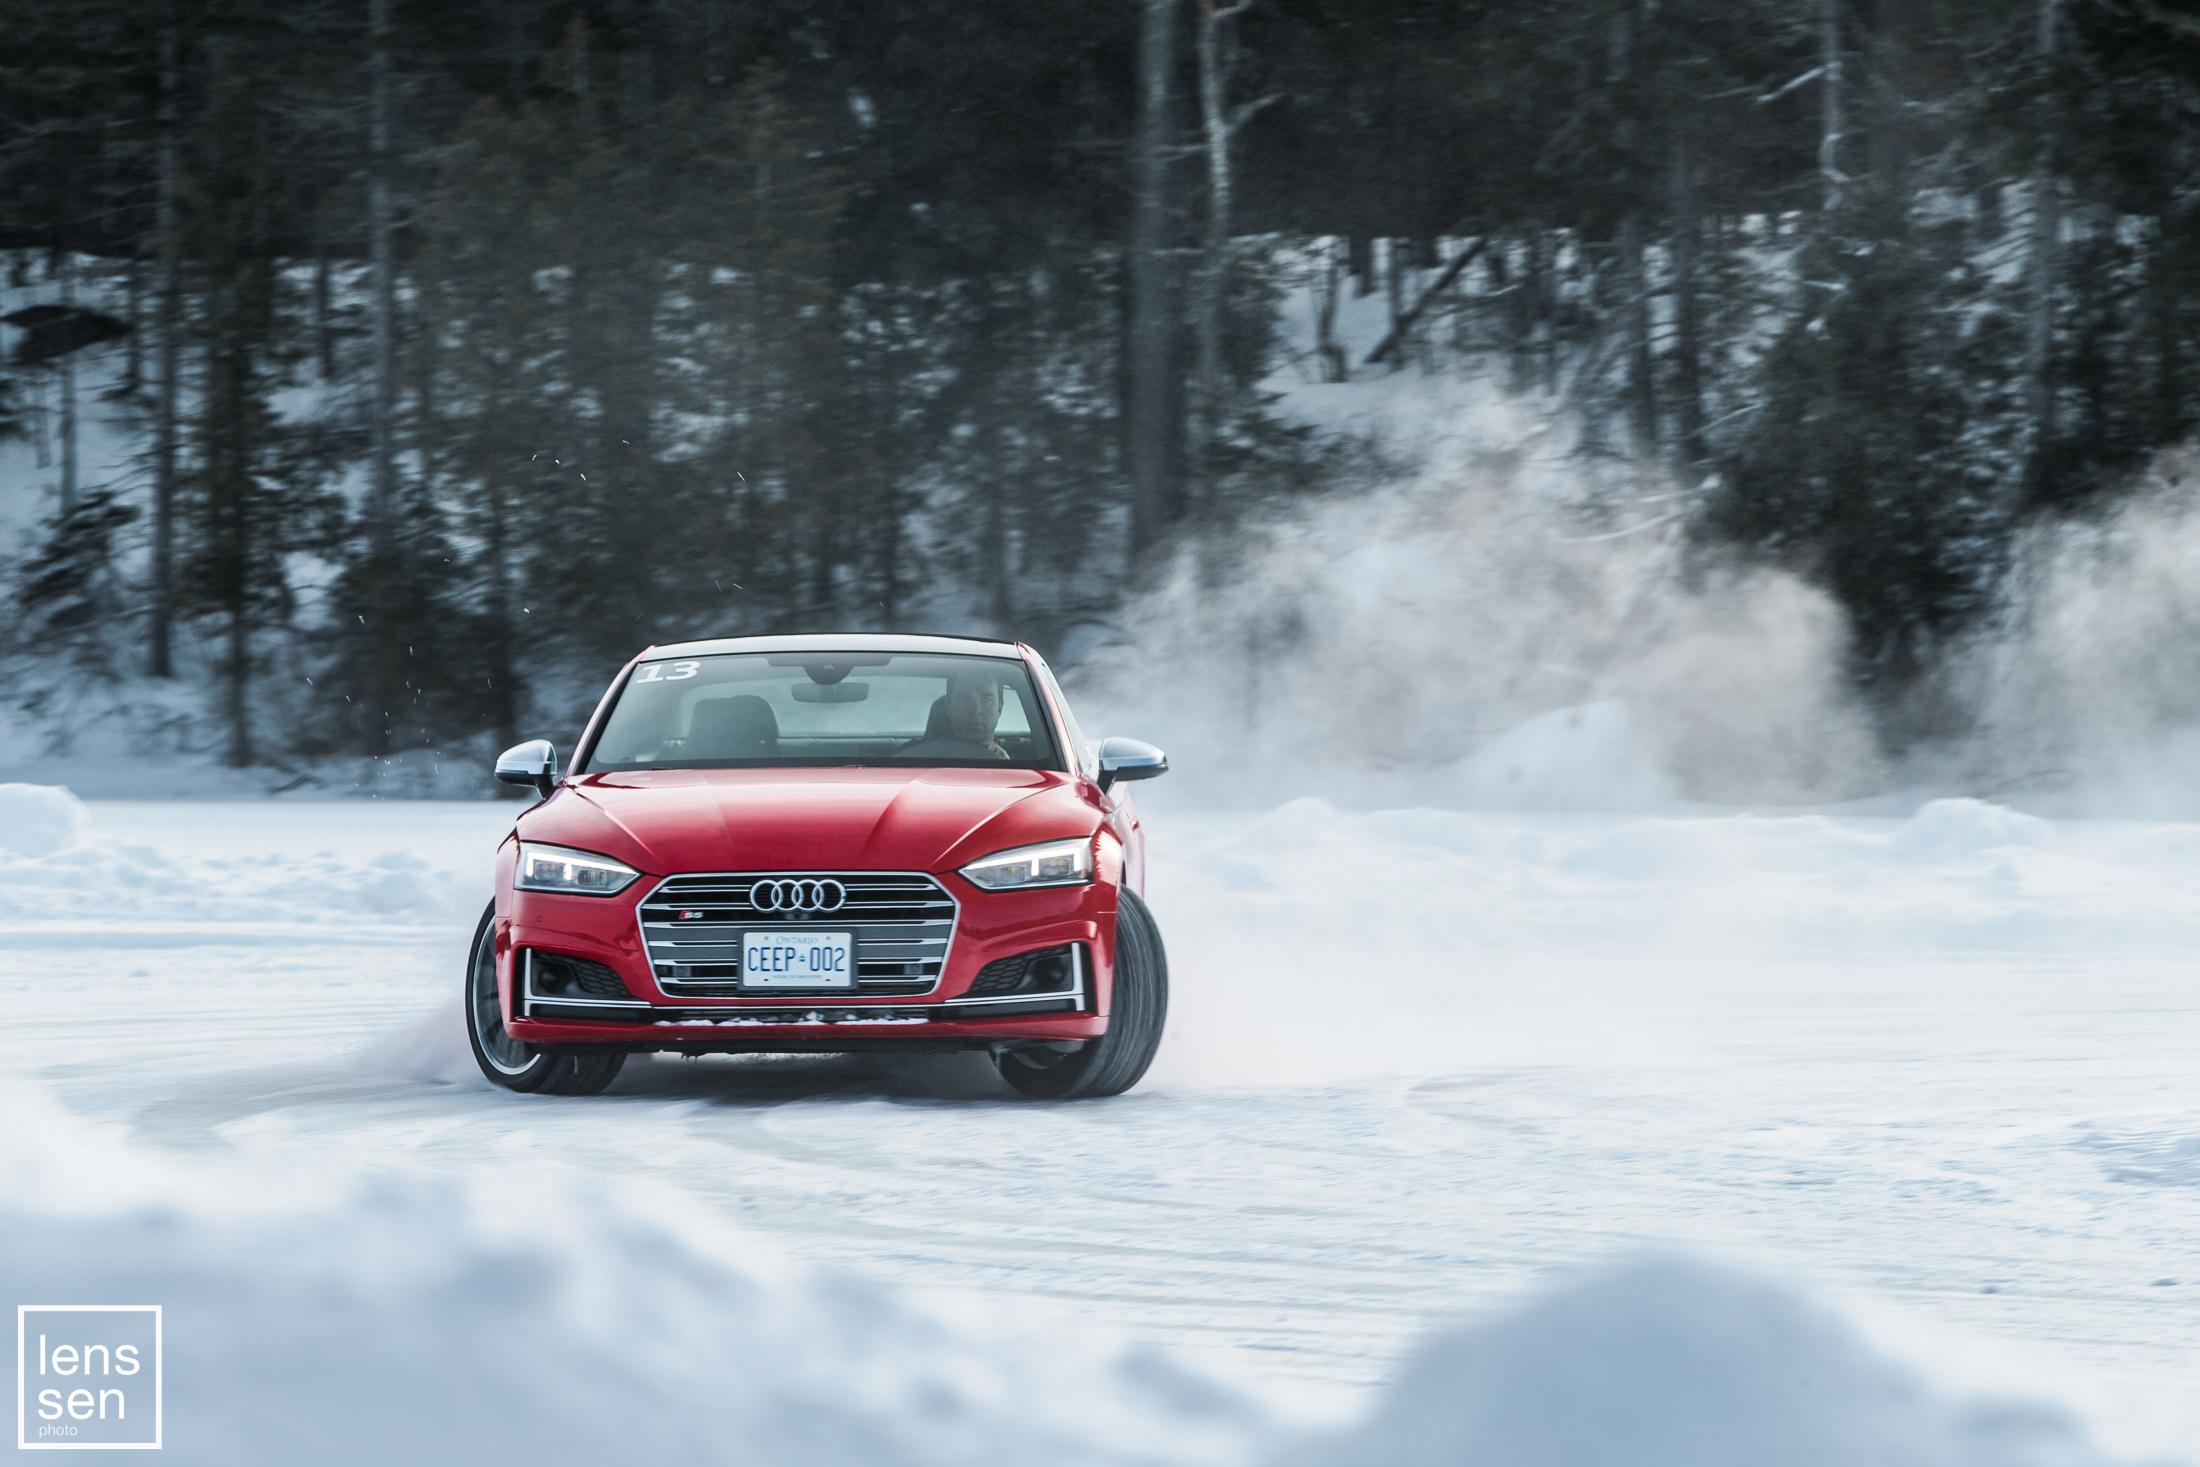 Audi Ice Experience - Sacacomie QC - Feb 2018 - 72 -0267.jpg